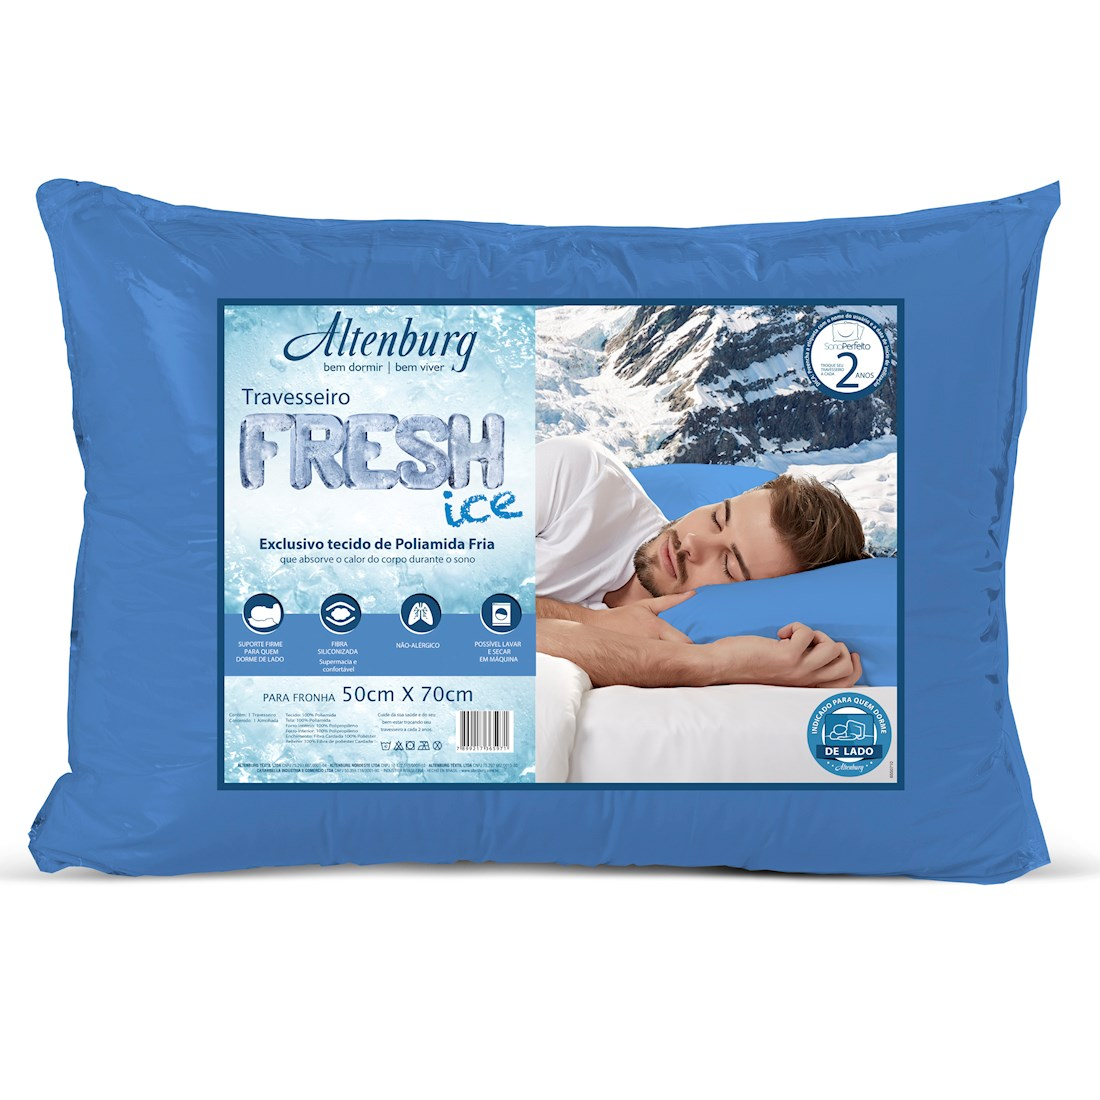 Travesseiro Altenburg 48×70 Fresh Ice Azul